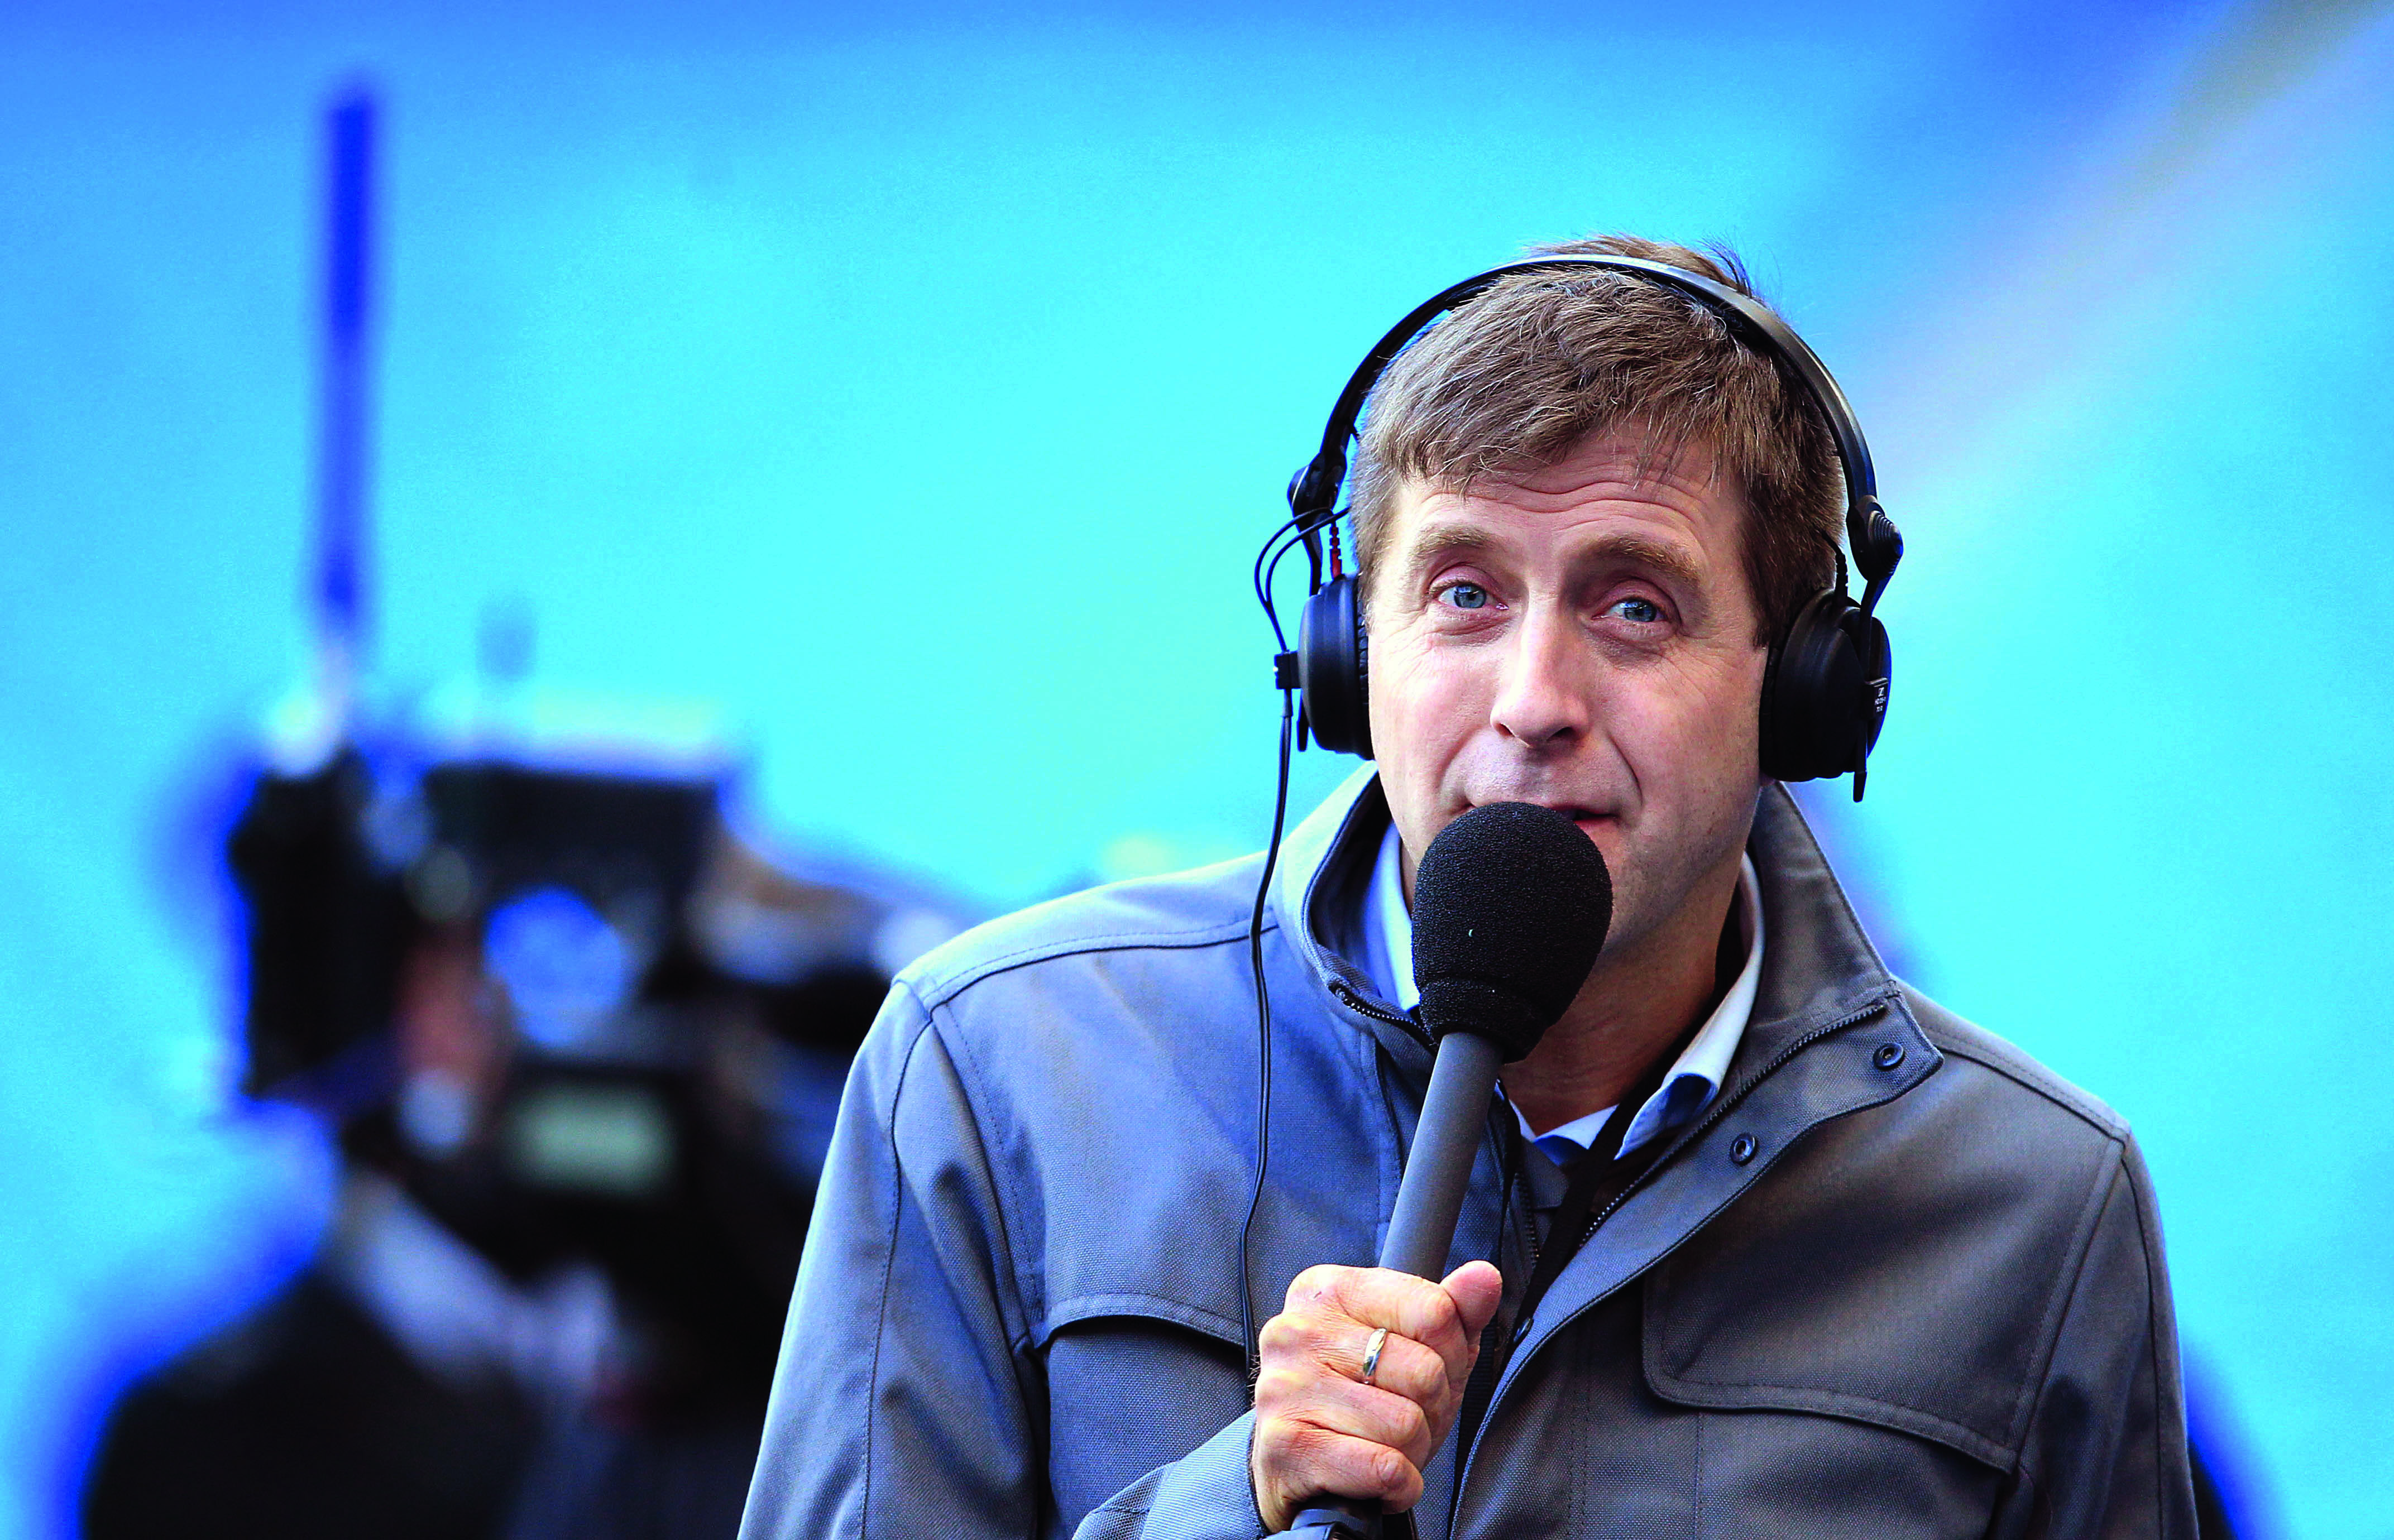 BBC 5Live presenter Mark Chapman